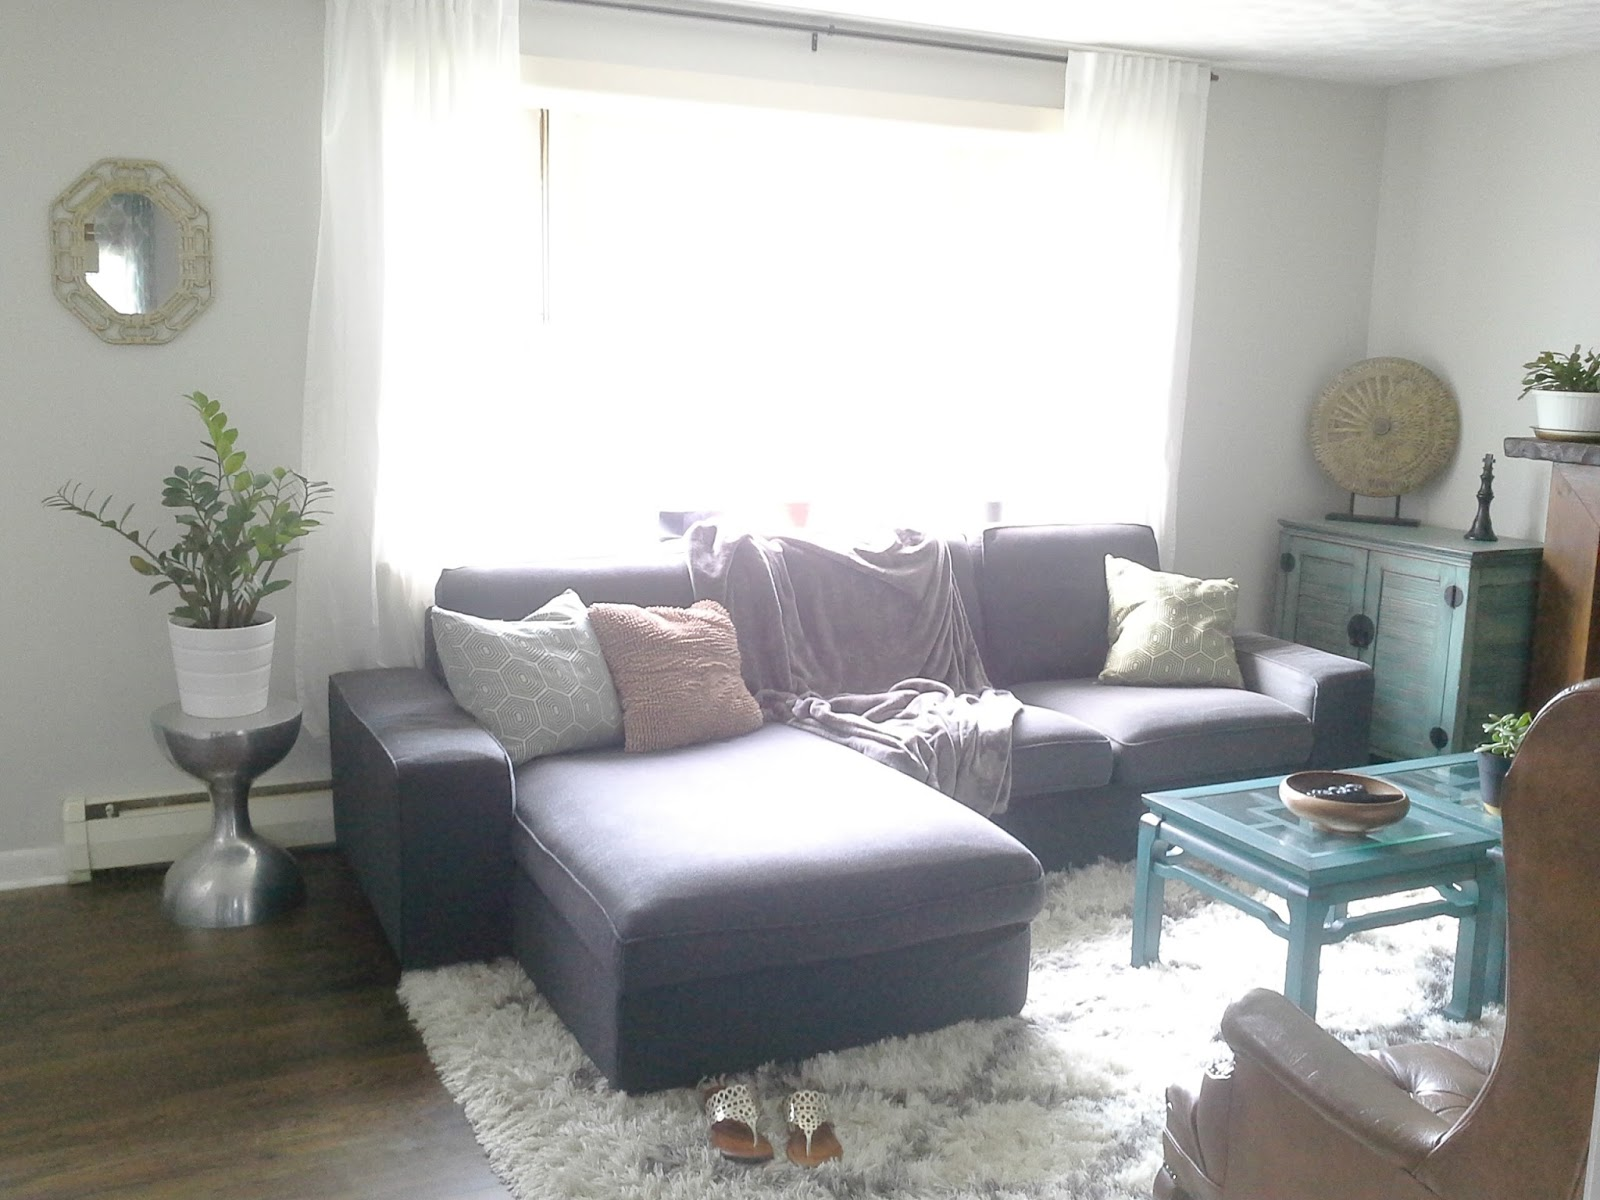 Kivik Sofa And Chaise Lounge Orrsta Light Gray 1025theparty Com